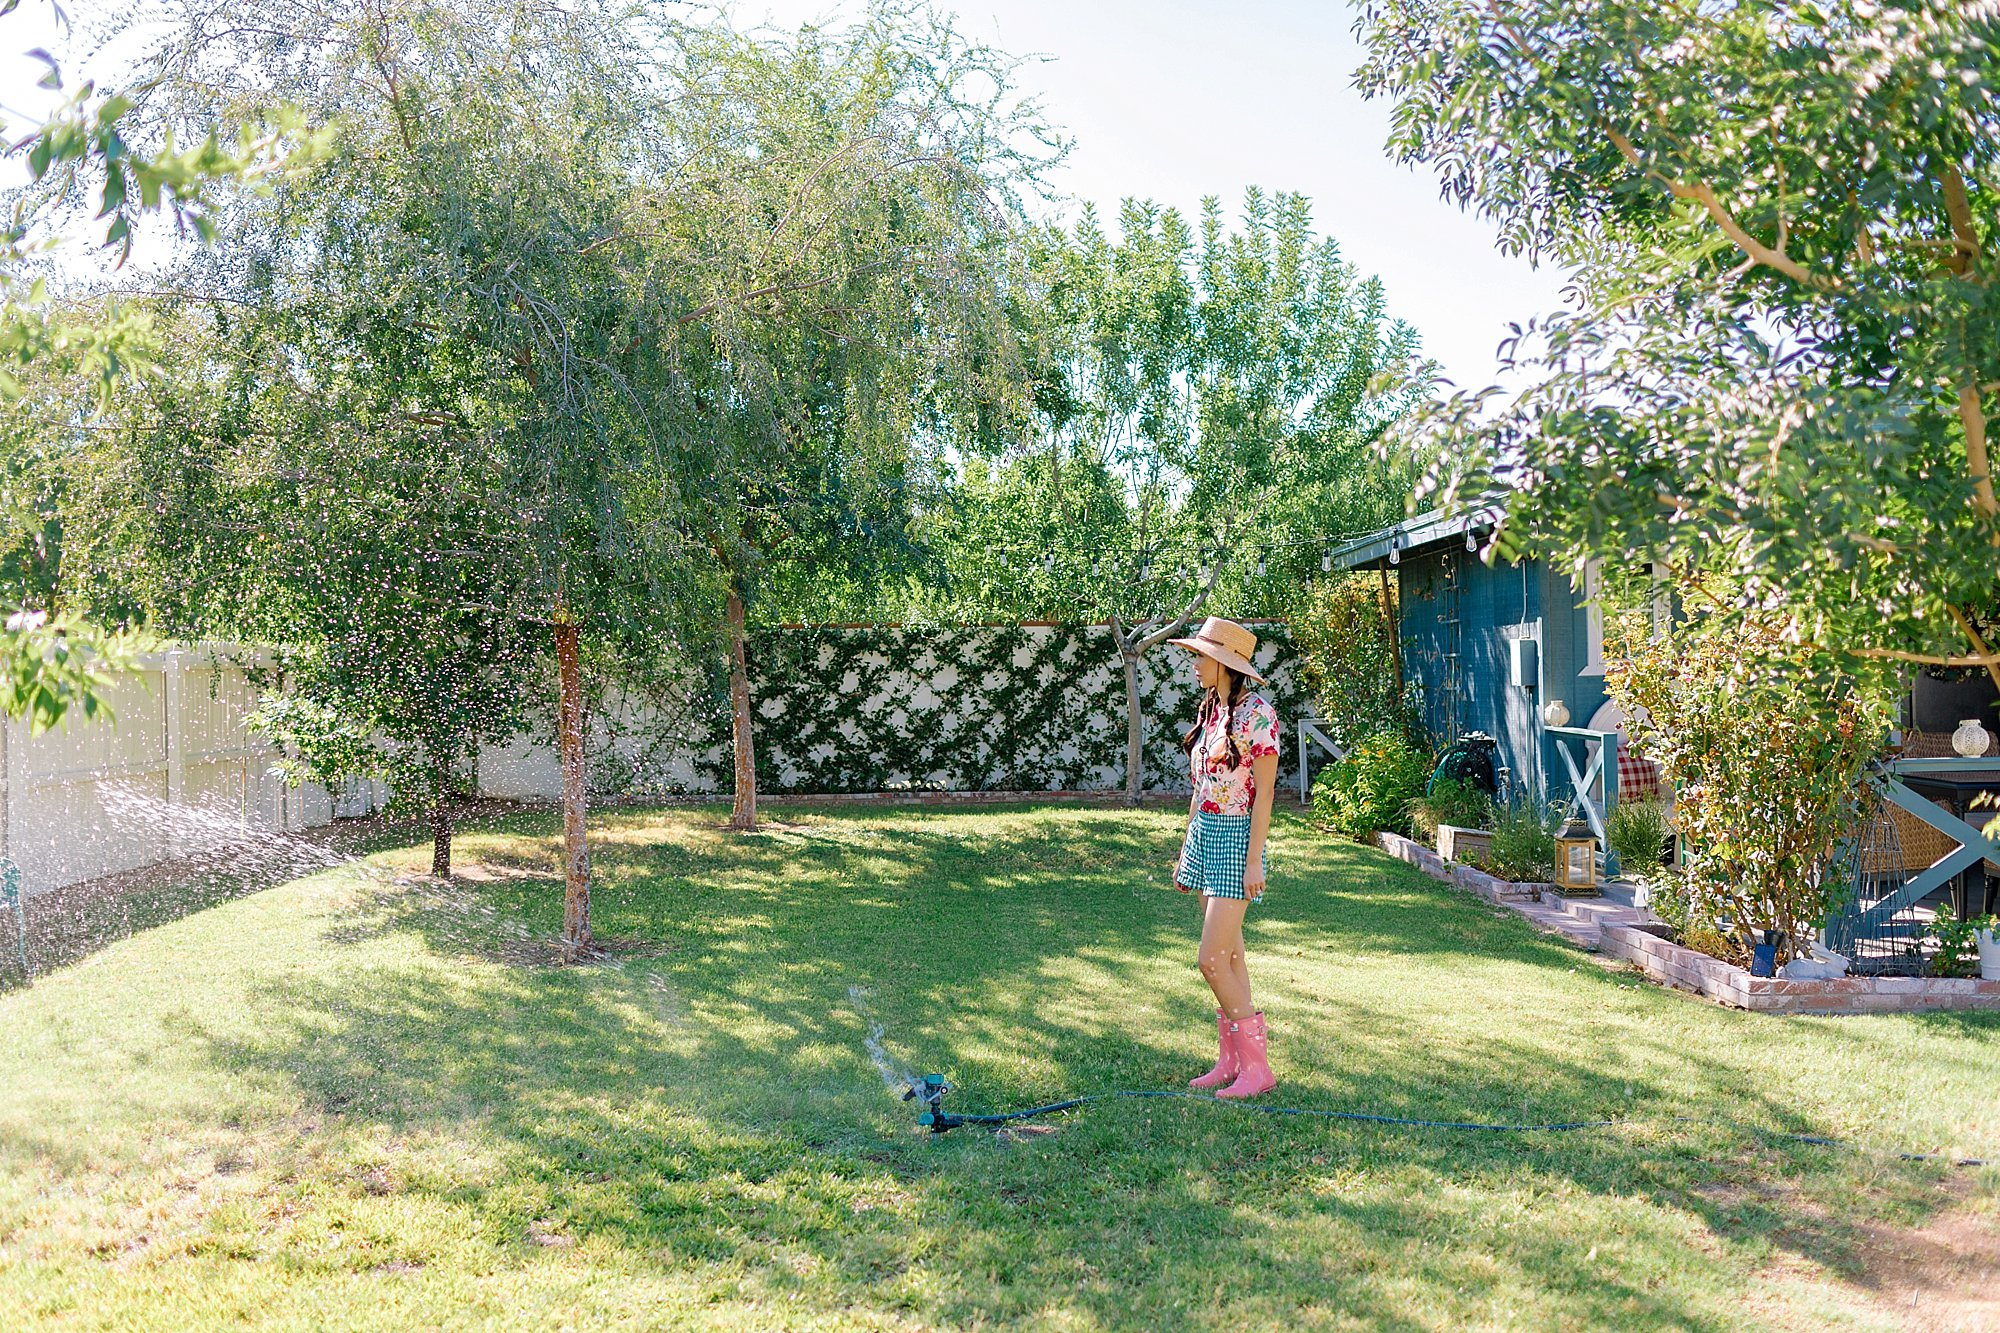 Diana Elizabeth backyard watching the lawn get sprayed with a sprinkler, jasmine trellis in the baackground